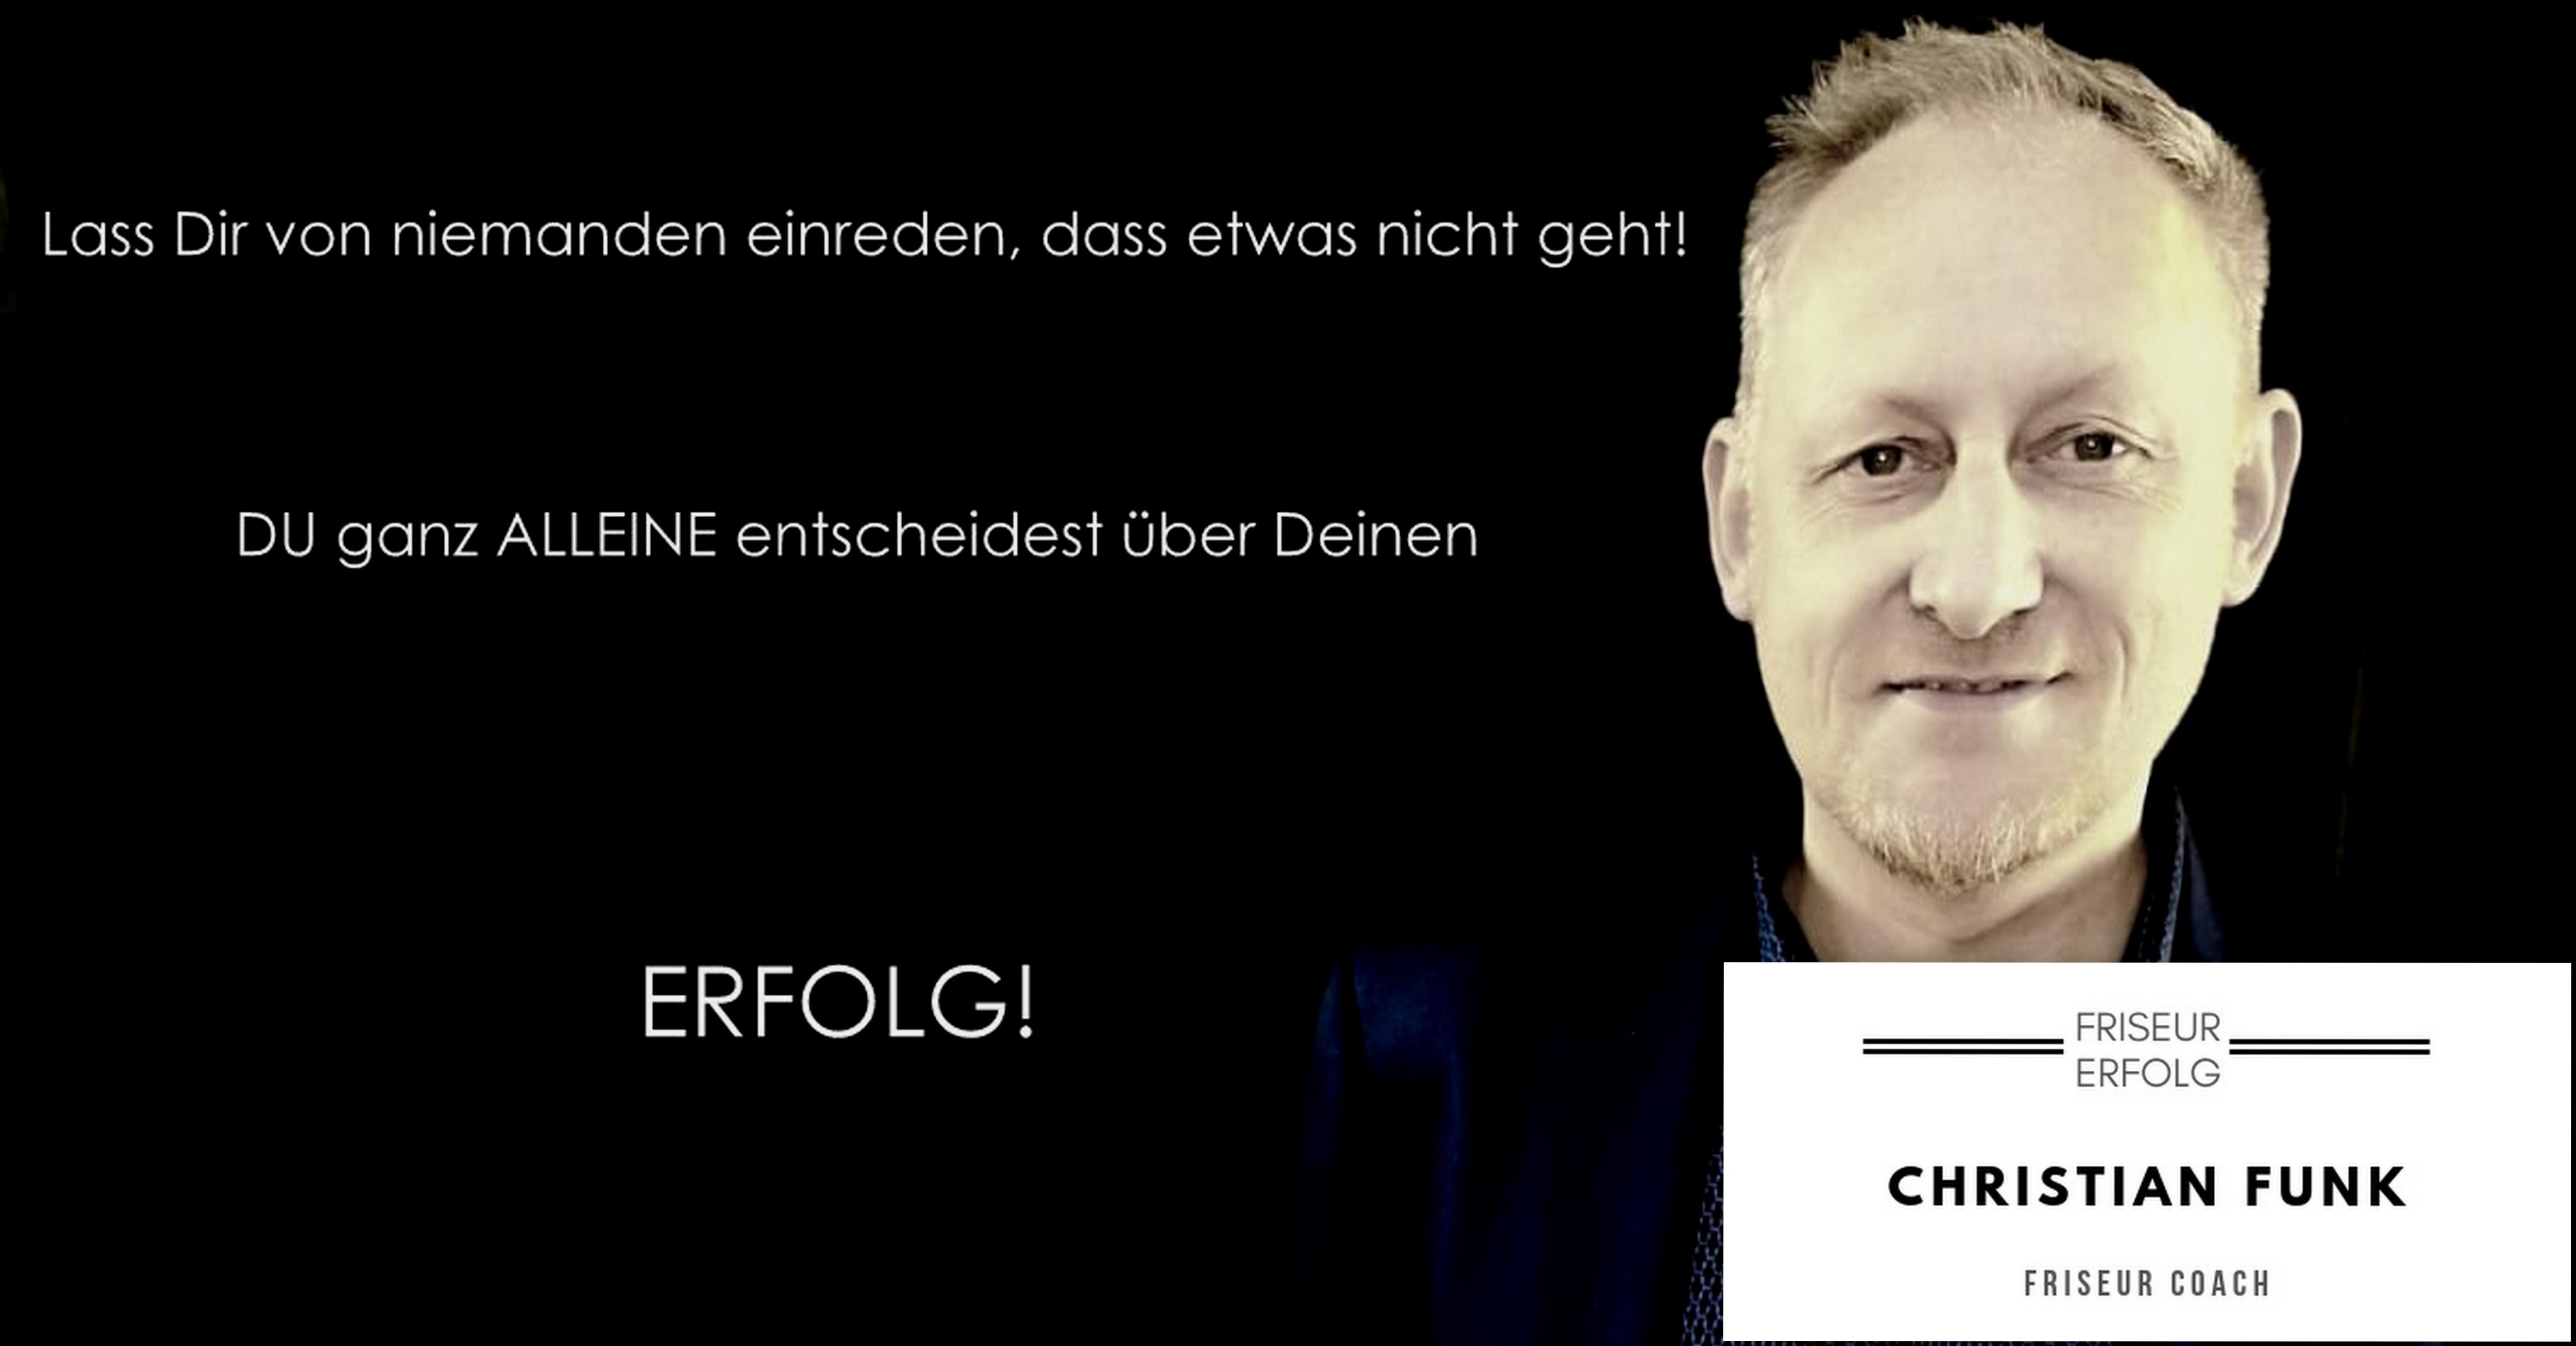 Friseur Coach - Christian Funk -Erfolg - Zitat -Logo1